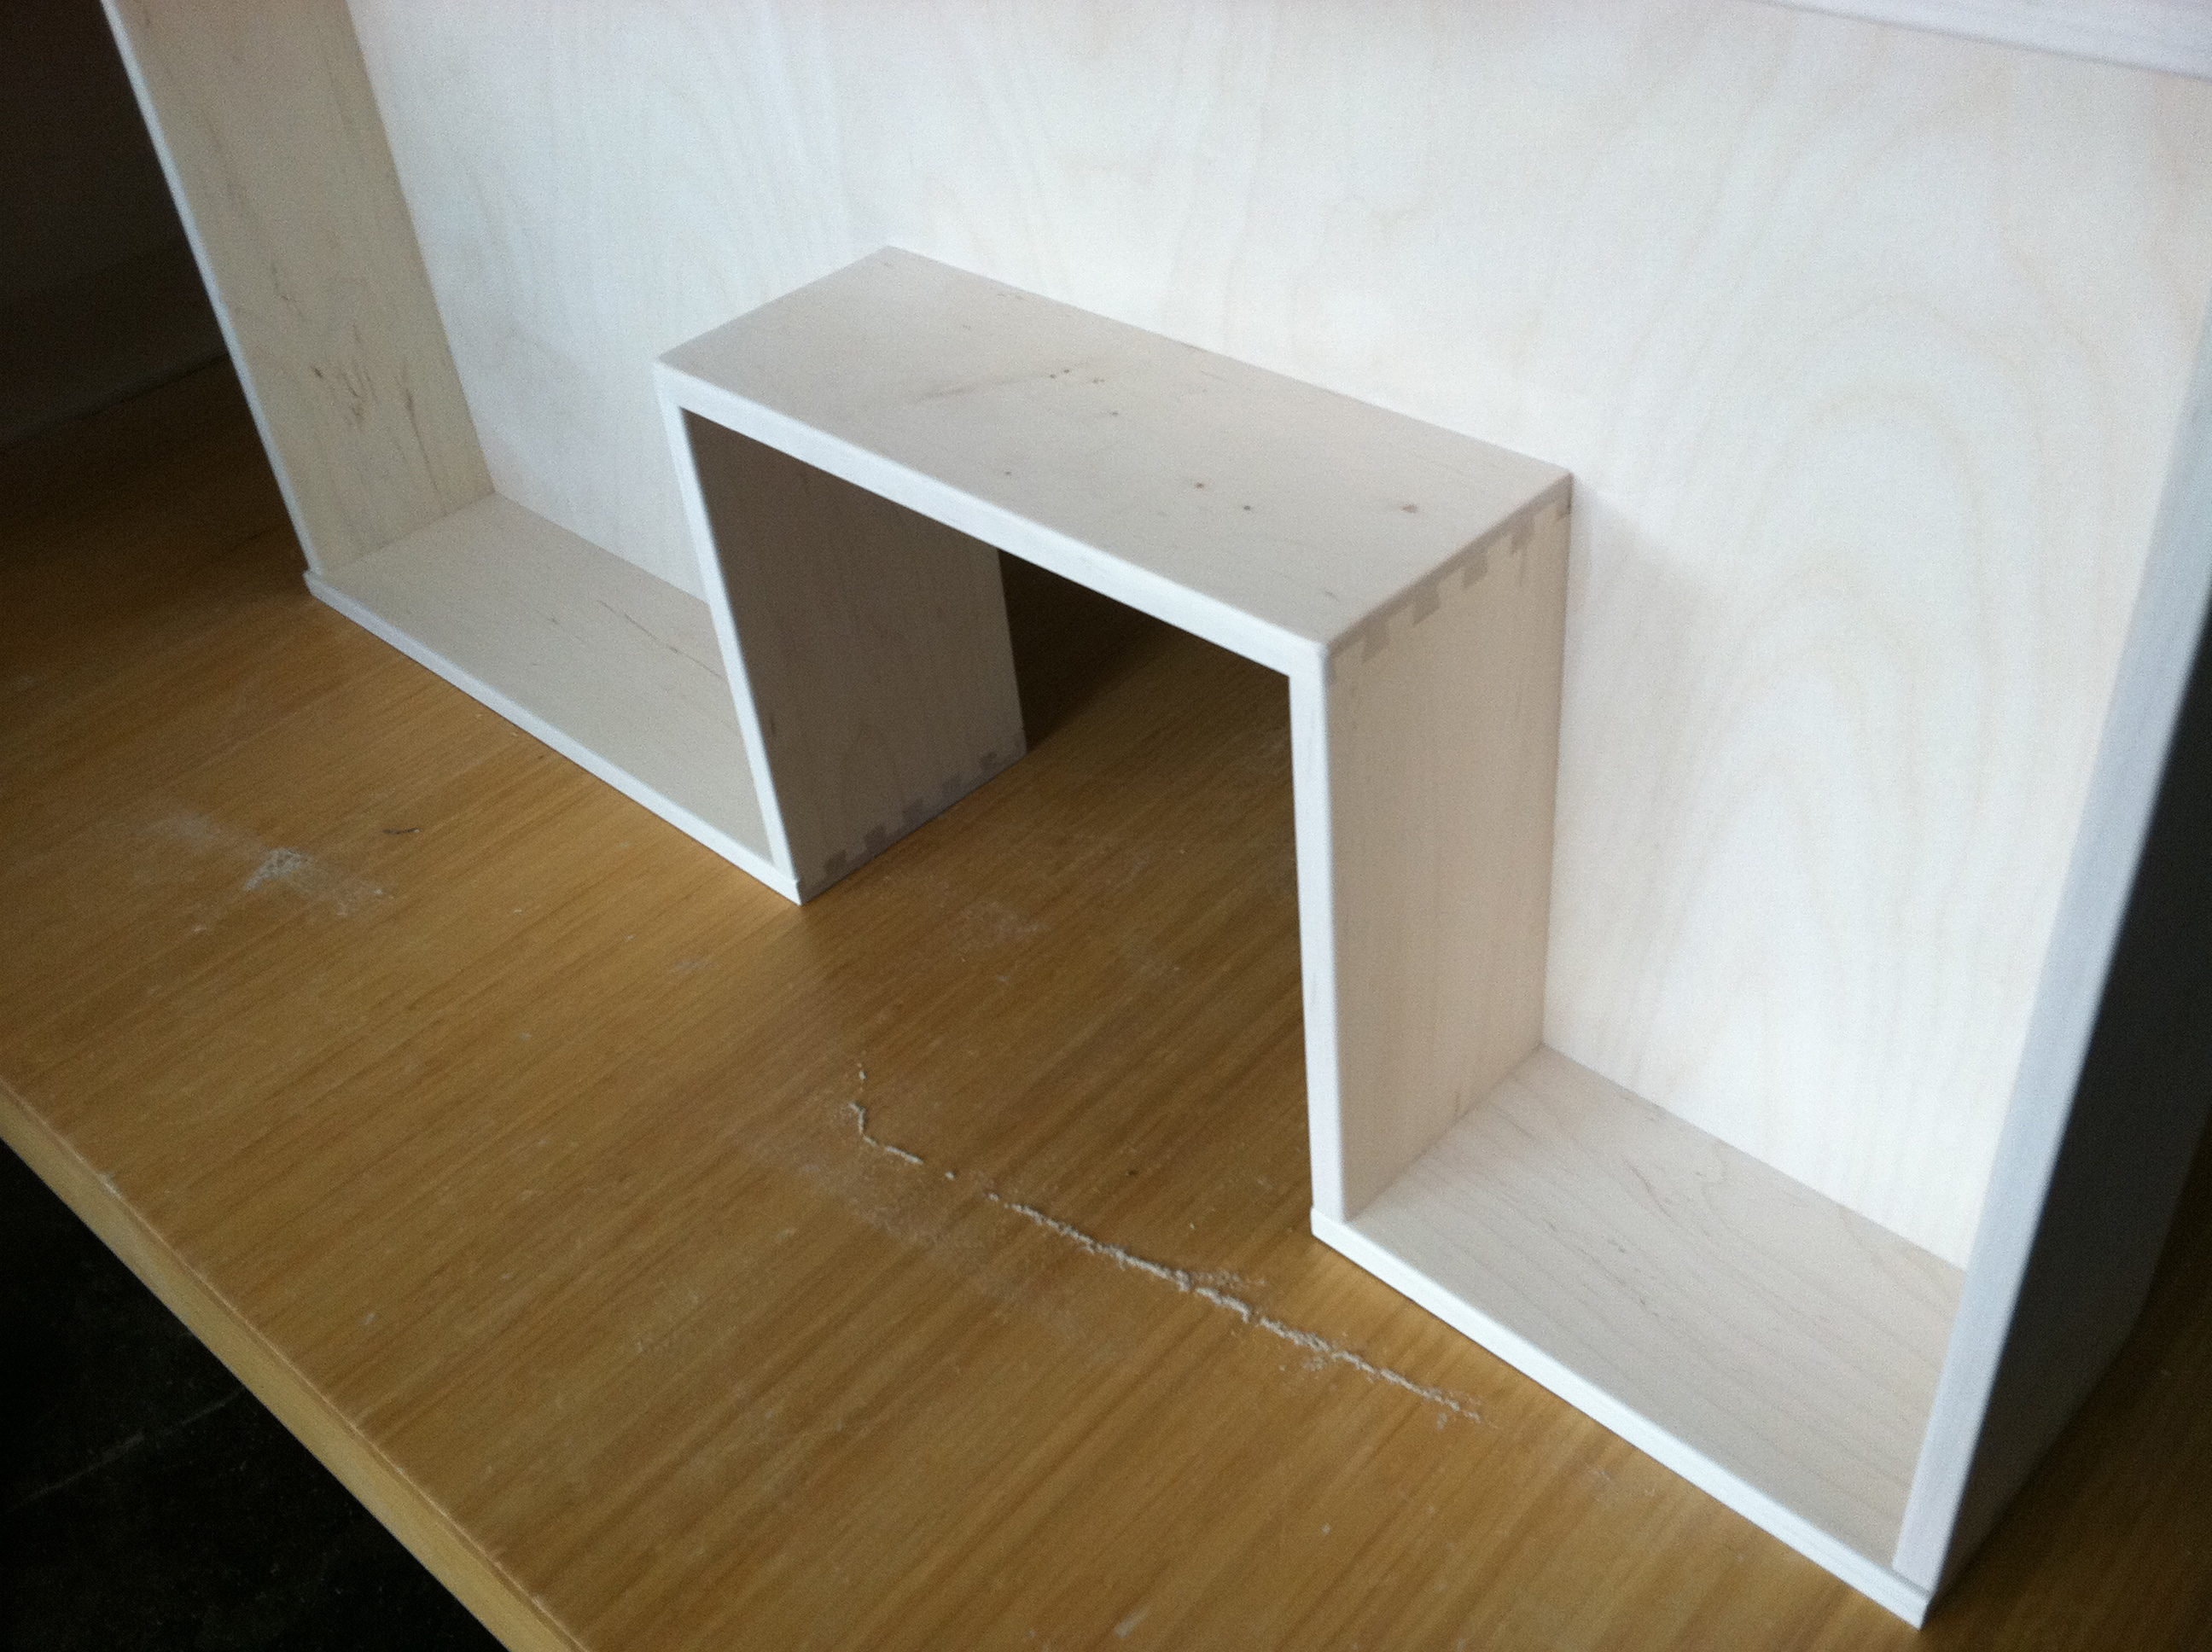 U-shaped Drawer